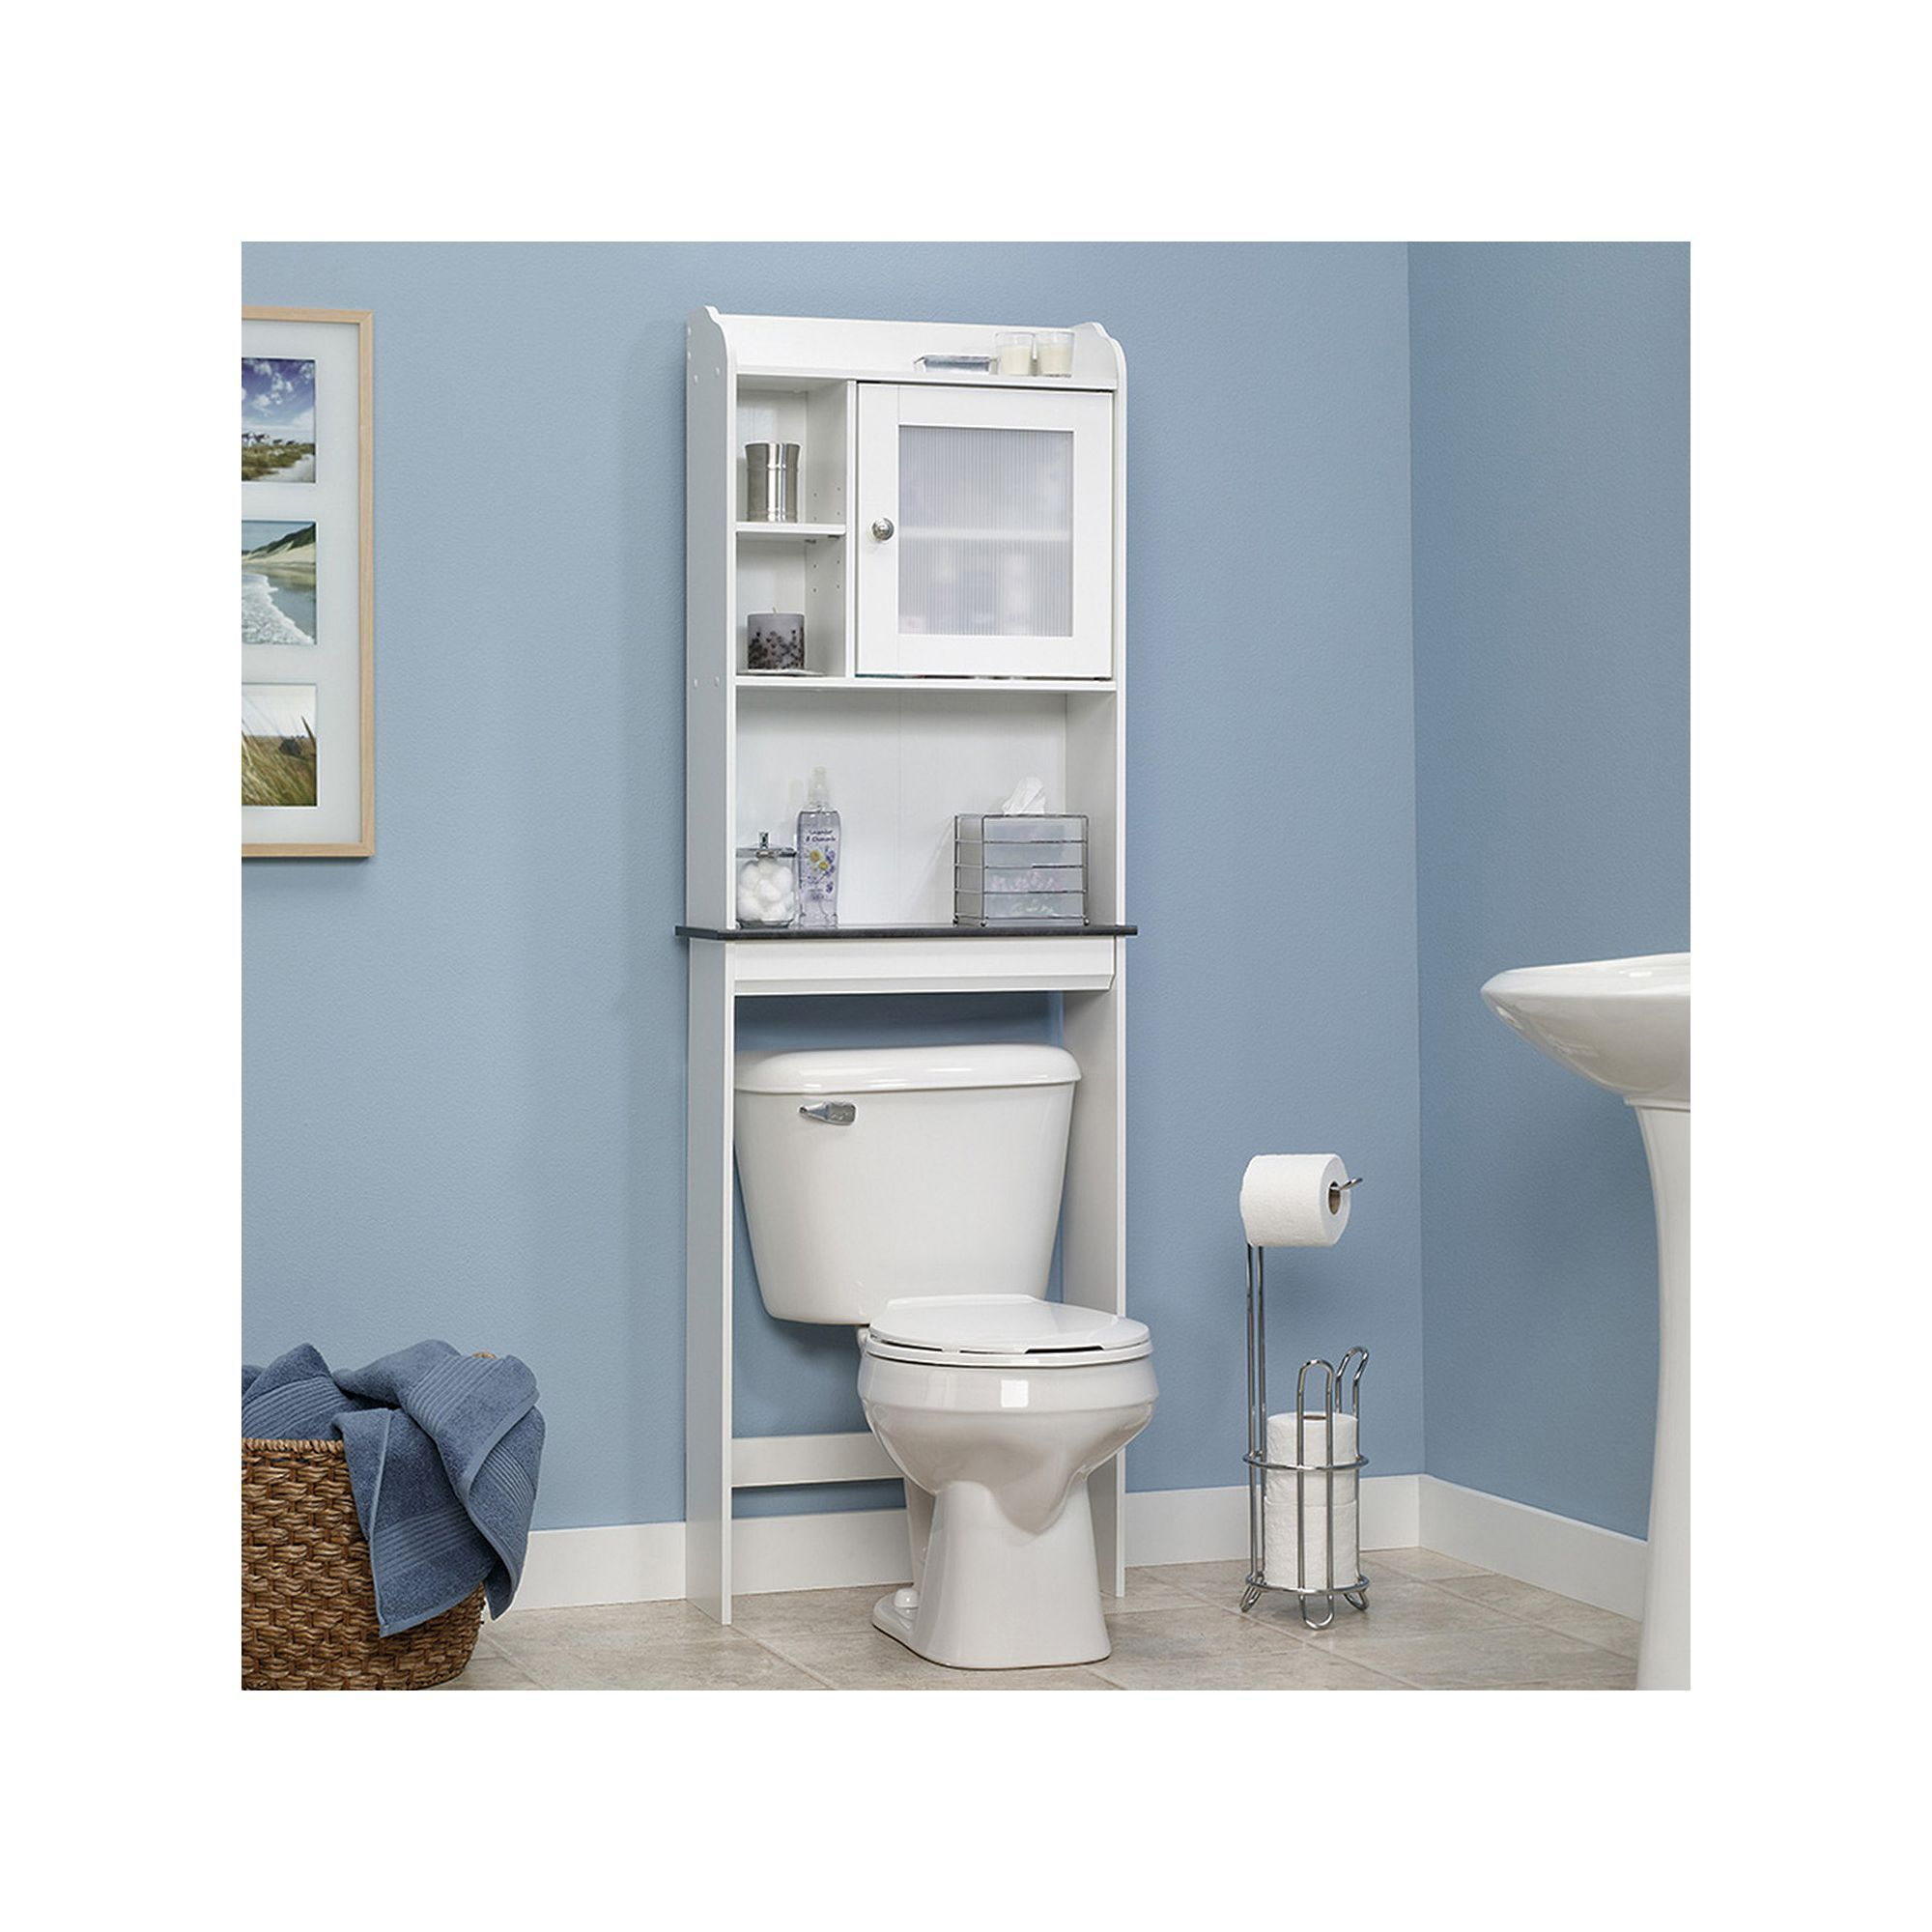 Sauder Caraway Bathroom Floor Cabinet White In 2020 Bathroom Floor Cabinets Over The Toilet Cabinet Bathroom Space Saver